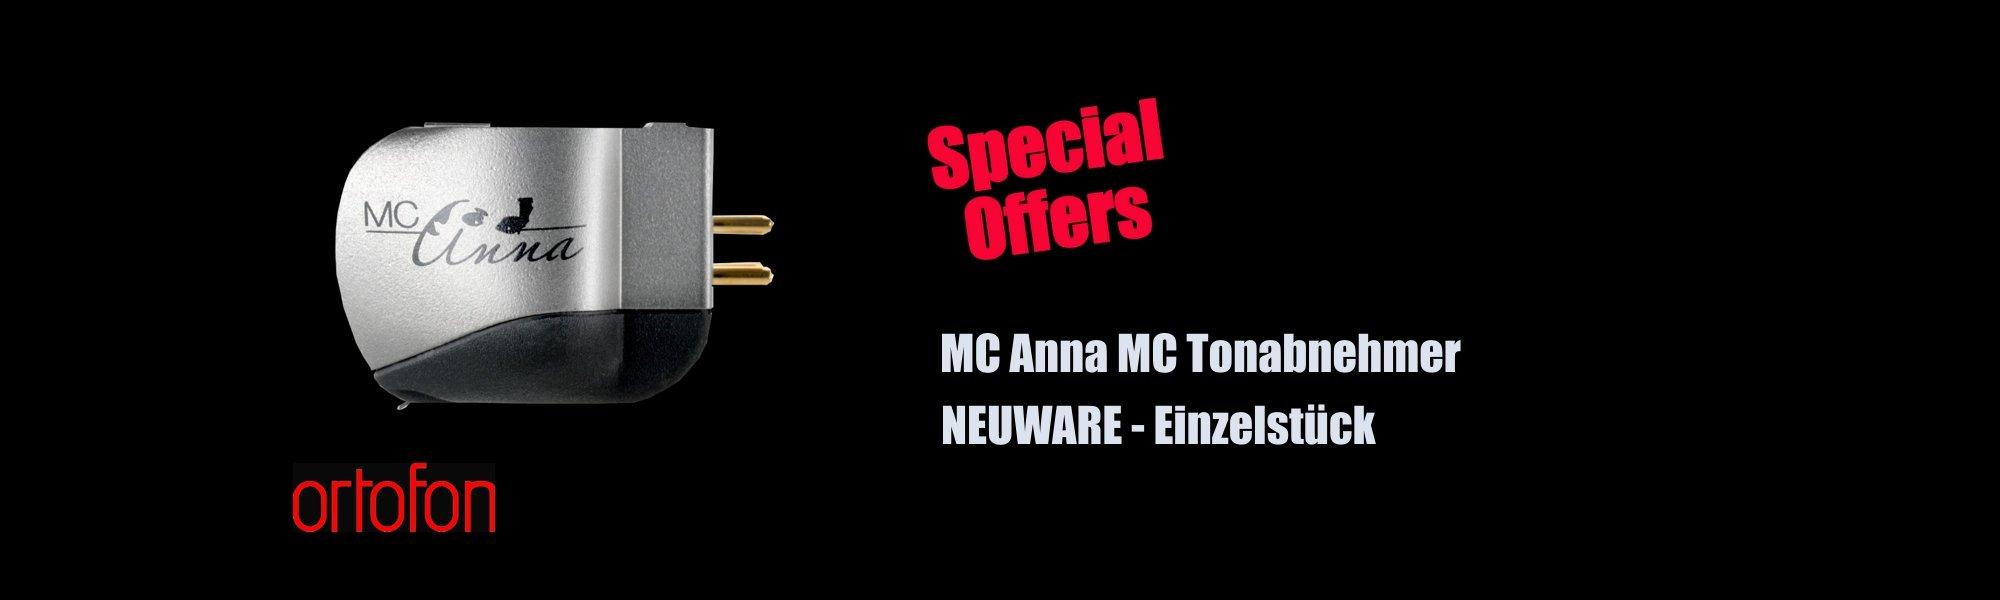 Angebot Ortonon MC Anna Tonabnehmer Neuware